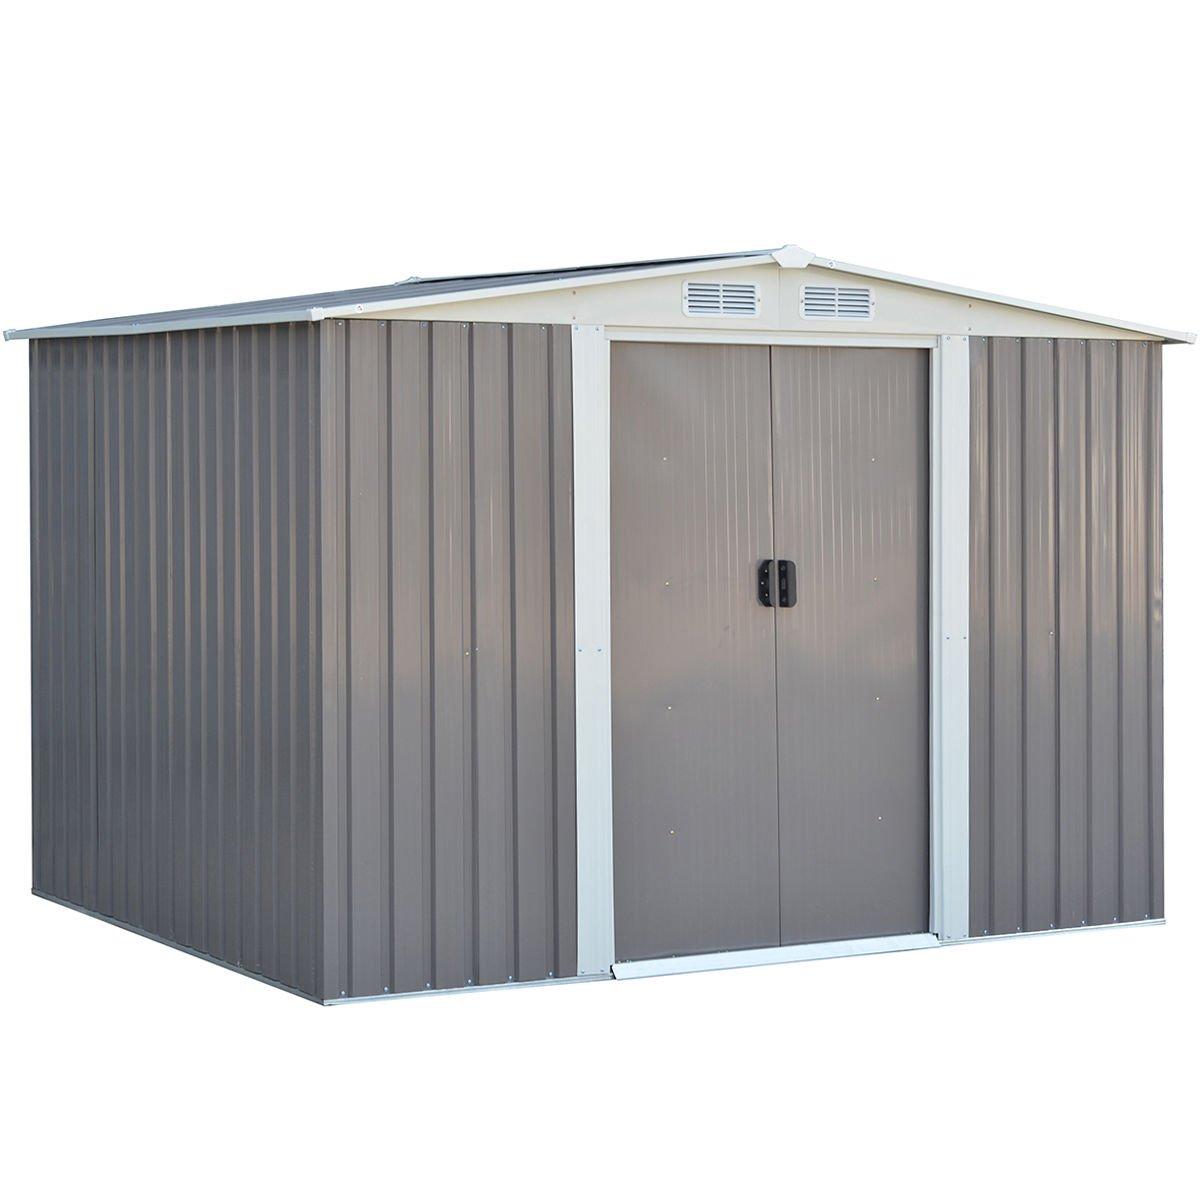 Goplus Galvanized Steel Outdoor Garden Storage Shed 6 x 8 Ft Heavy Duty Tool House W/ Sliding Door (Gray)